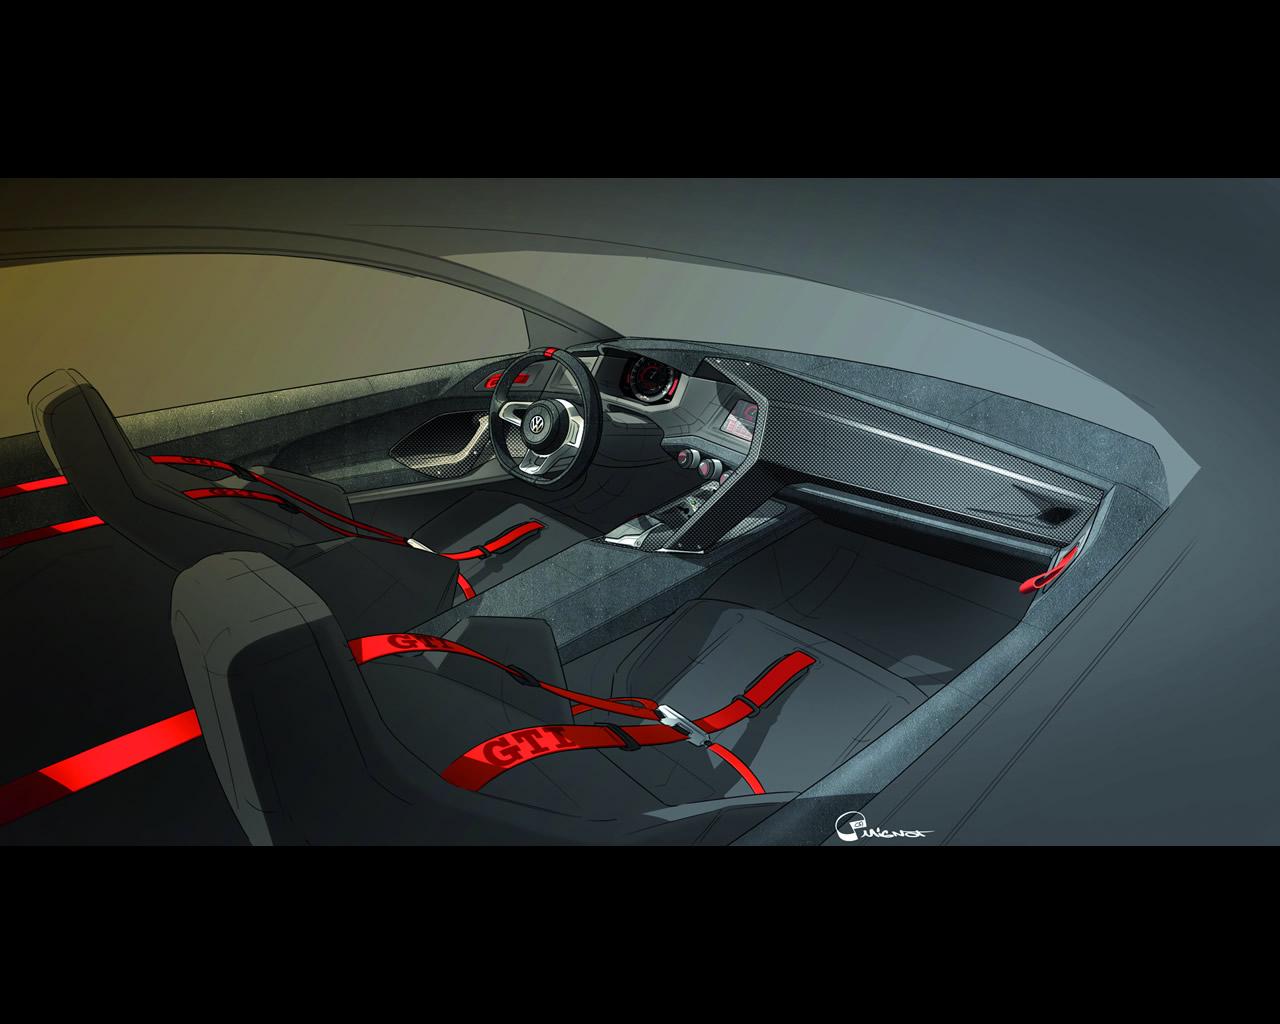 volkswagen 503 hp twin turbo v6 4wd design vision gti